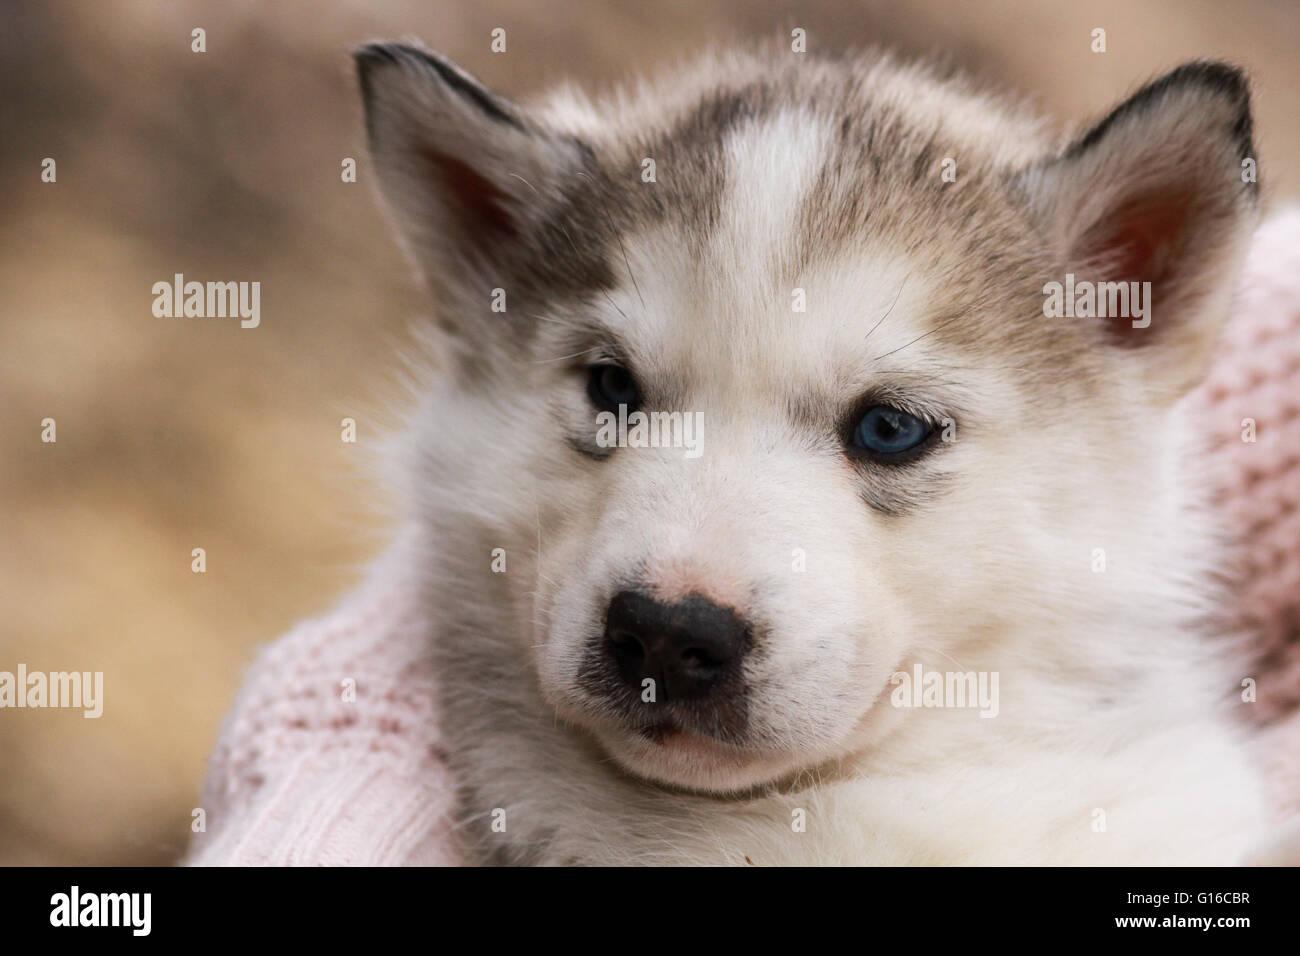 A Baby Siberian Husky Pup Stock Photo Alamy